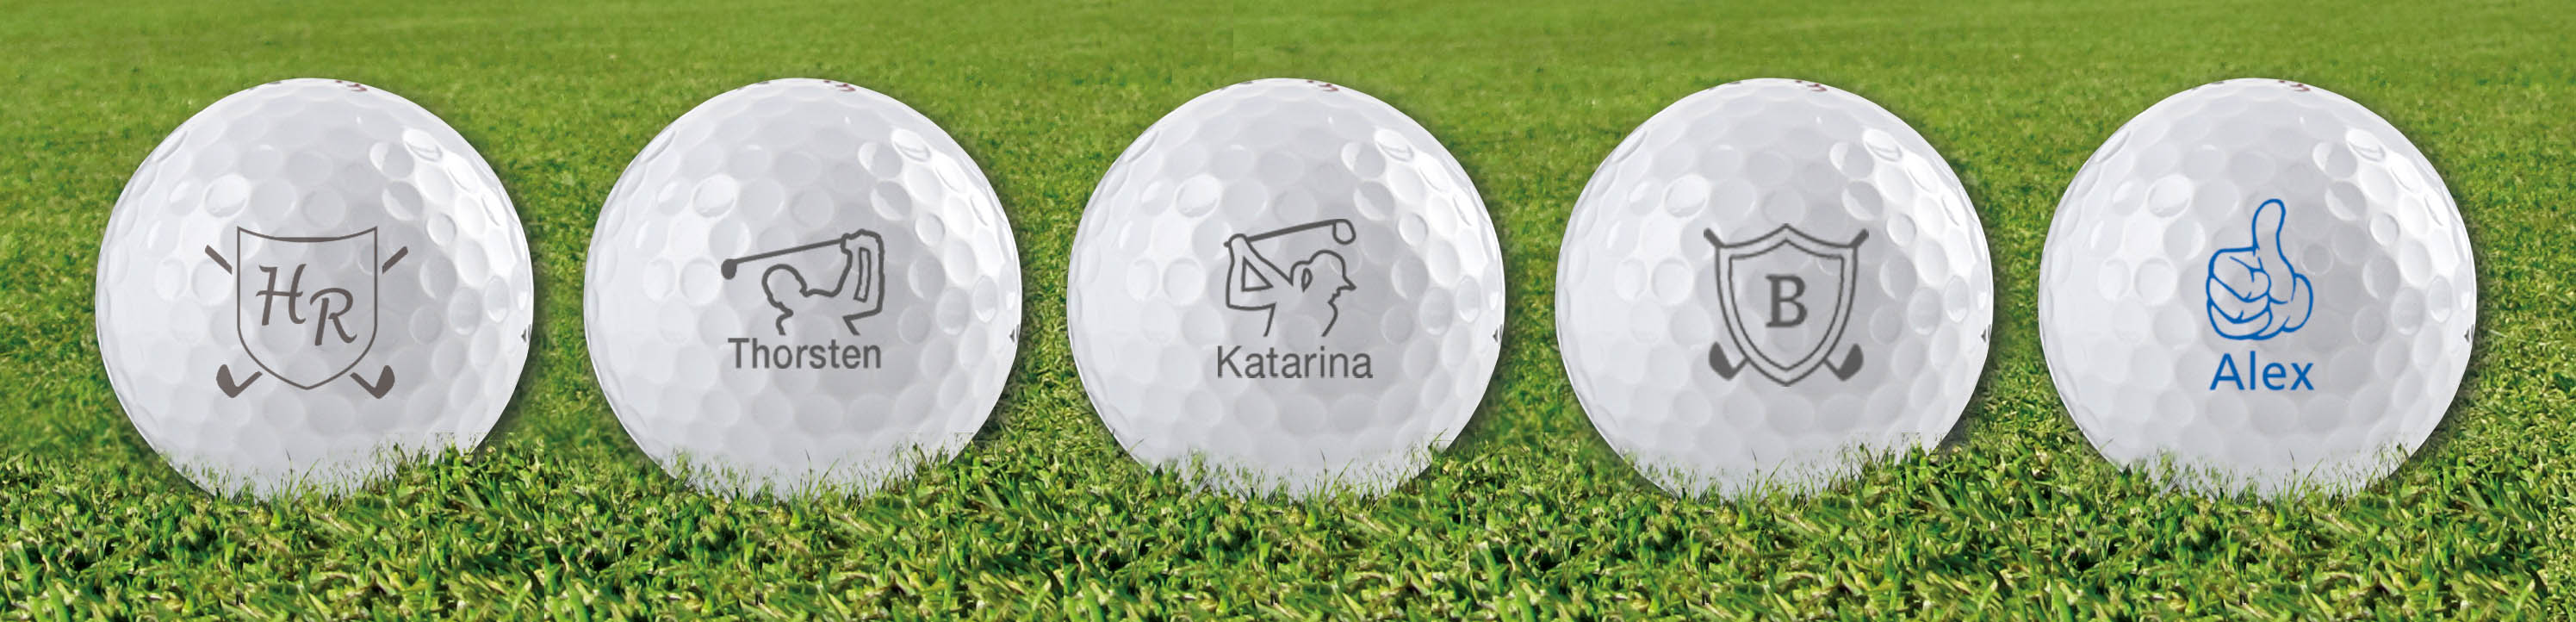 Golfmotive für den Golfballstempel